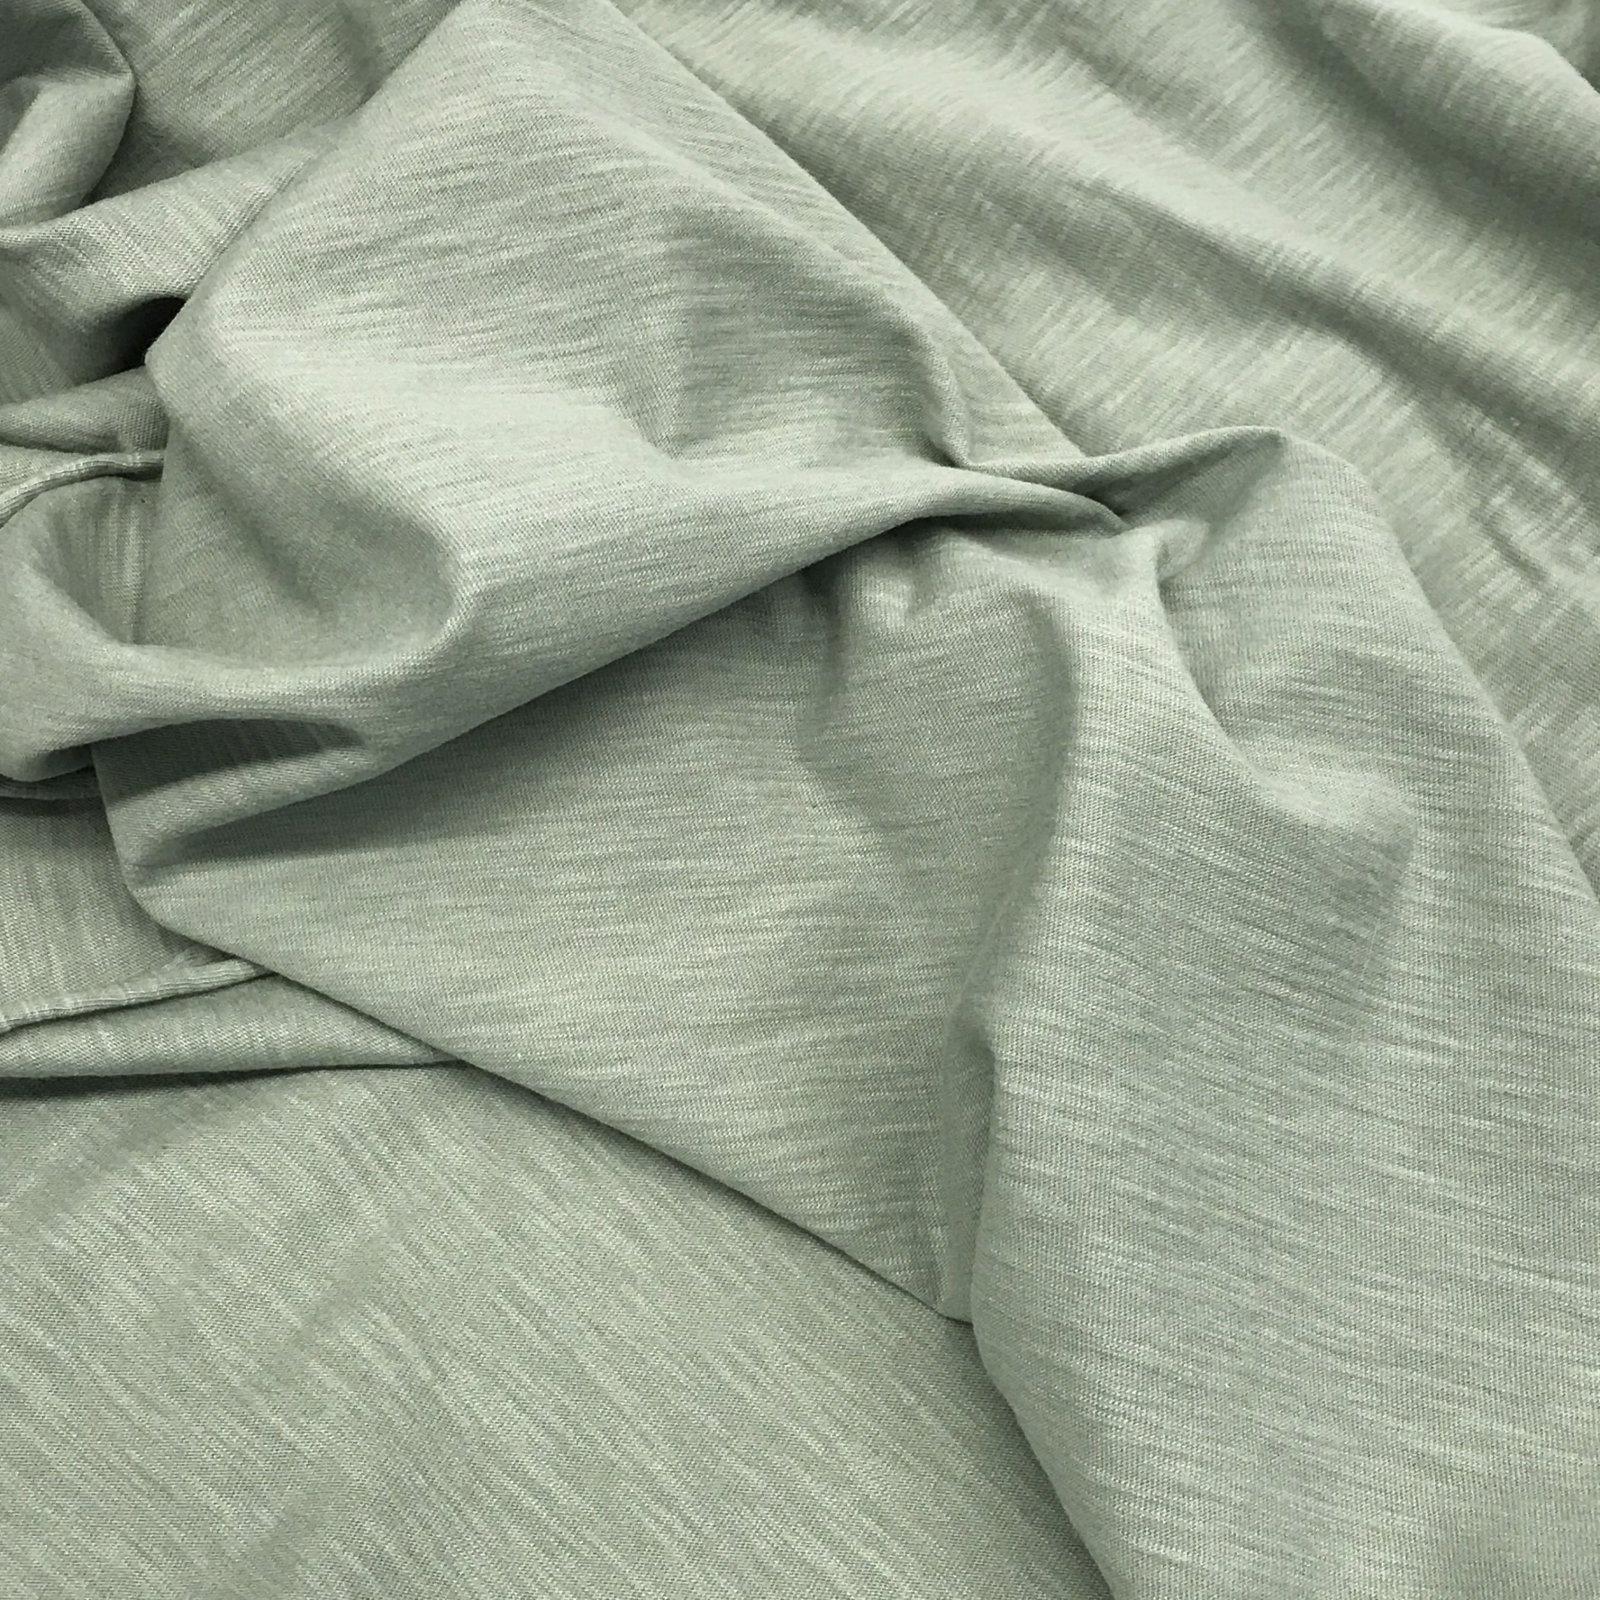 Cotton Slub Knit - Organic  Pistachio Green